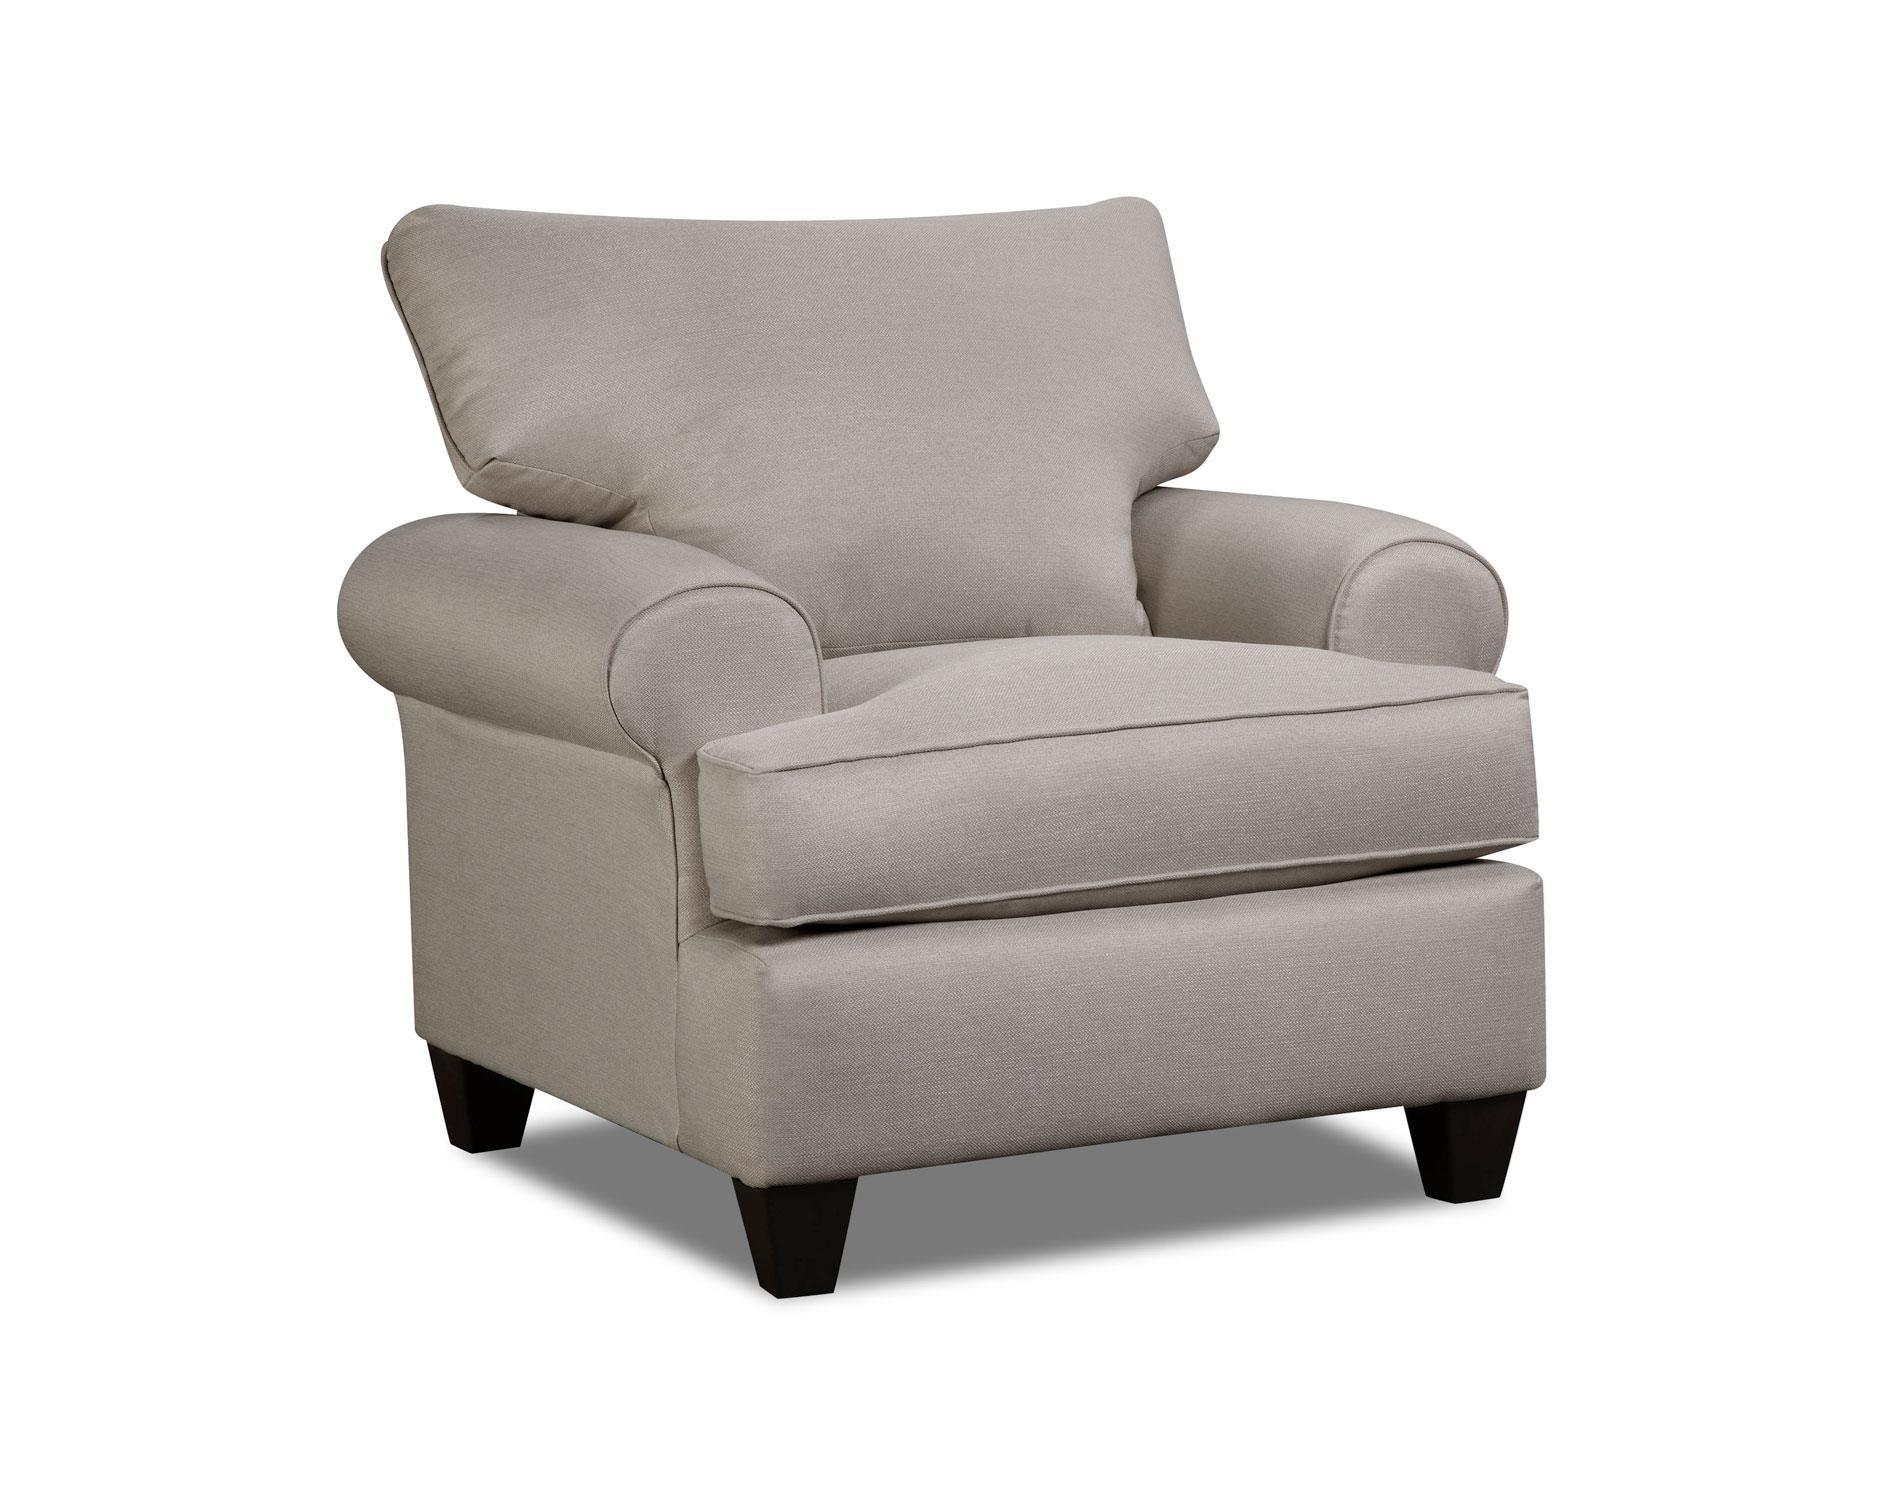 Corinthian Hogan Nickel Chair - Item Number: 47G1